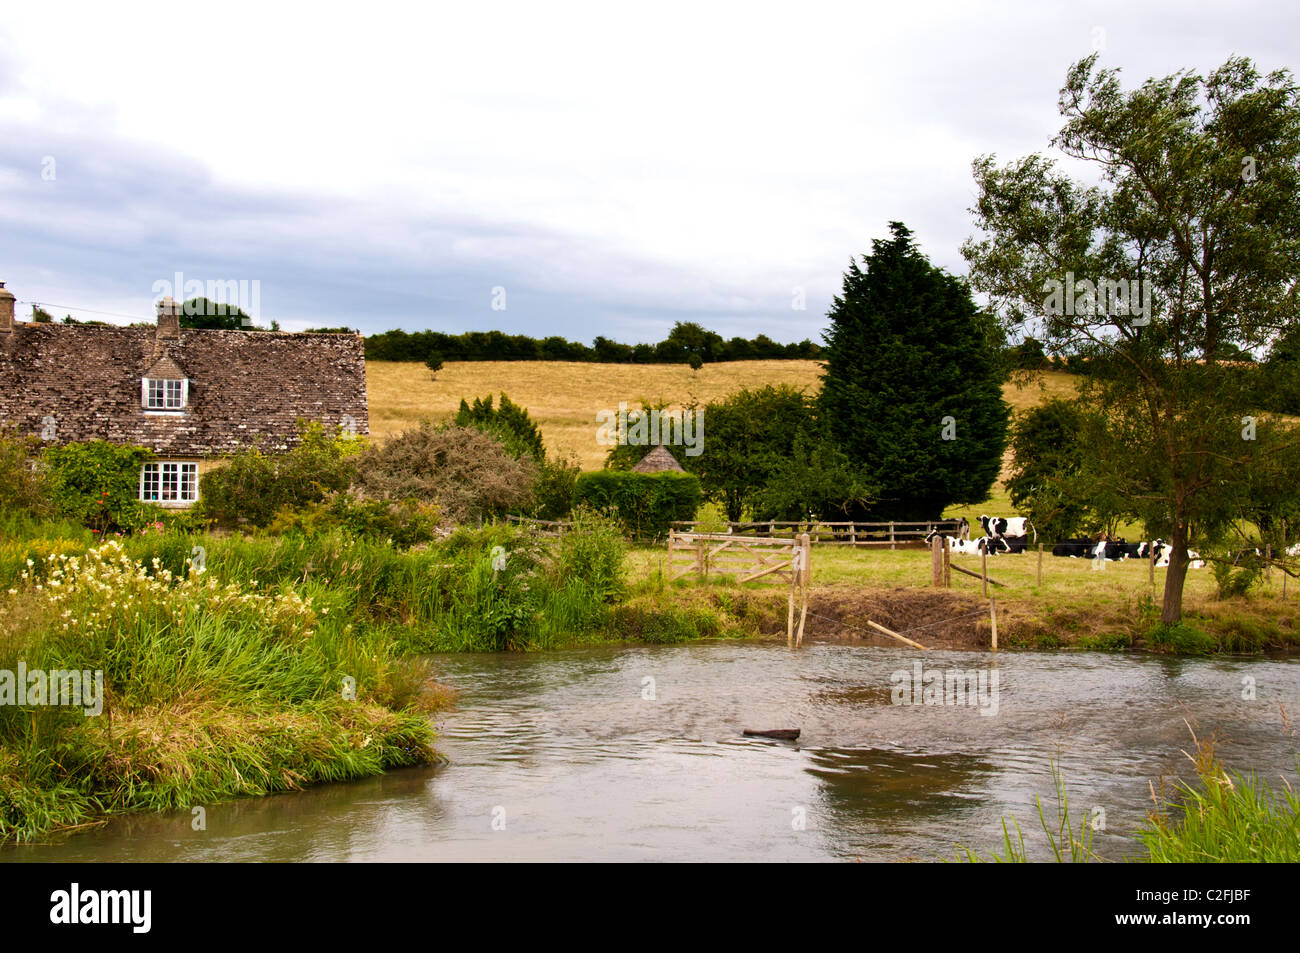 Pastoral scene at the river windrush  at Swinbrook, idyllische Szene am Flusse Windrush nahe Swinbrook Stock Photo